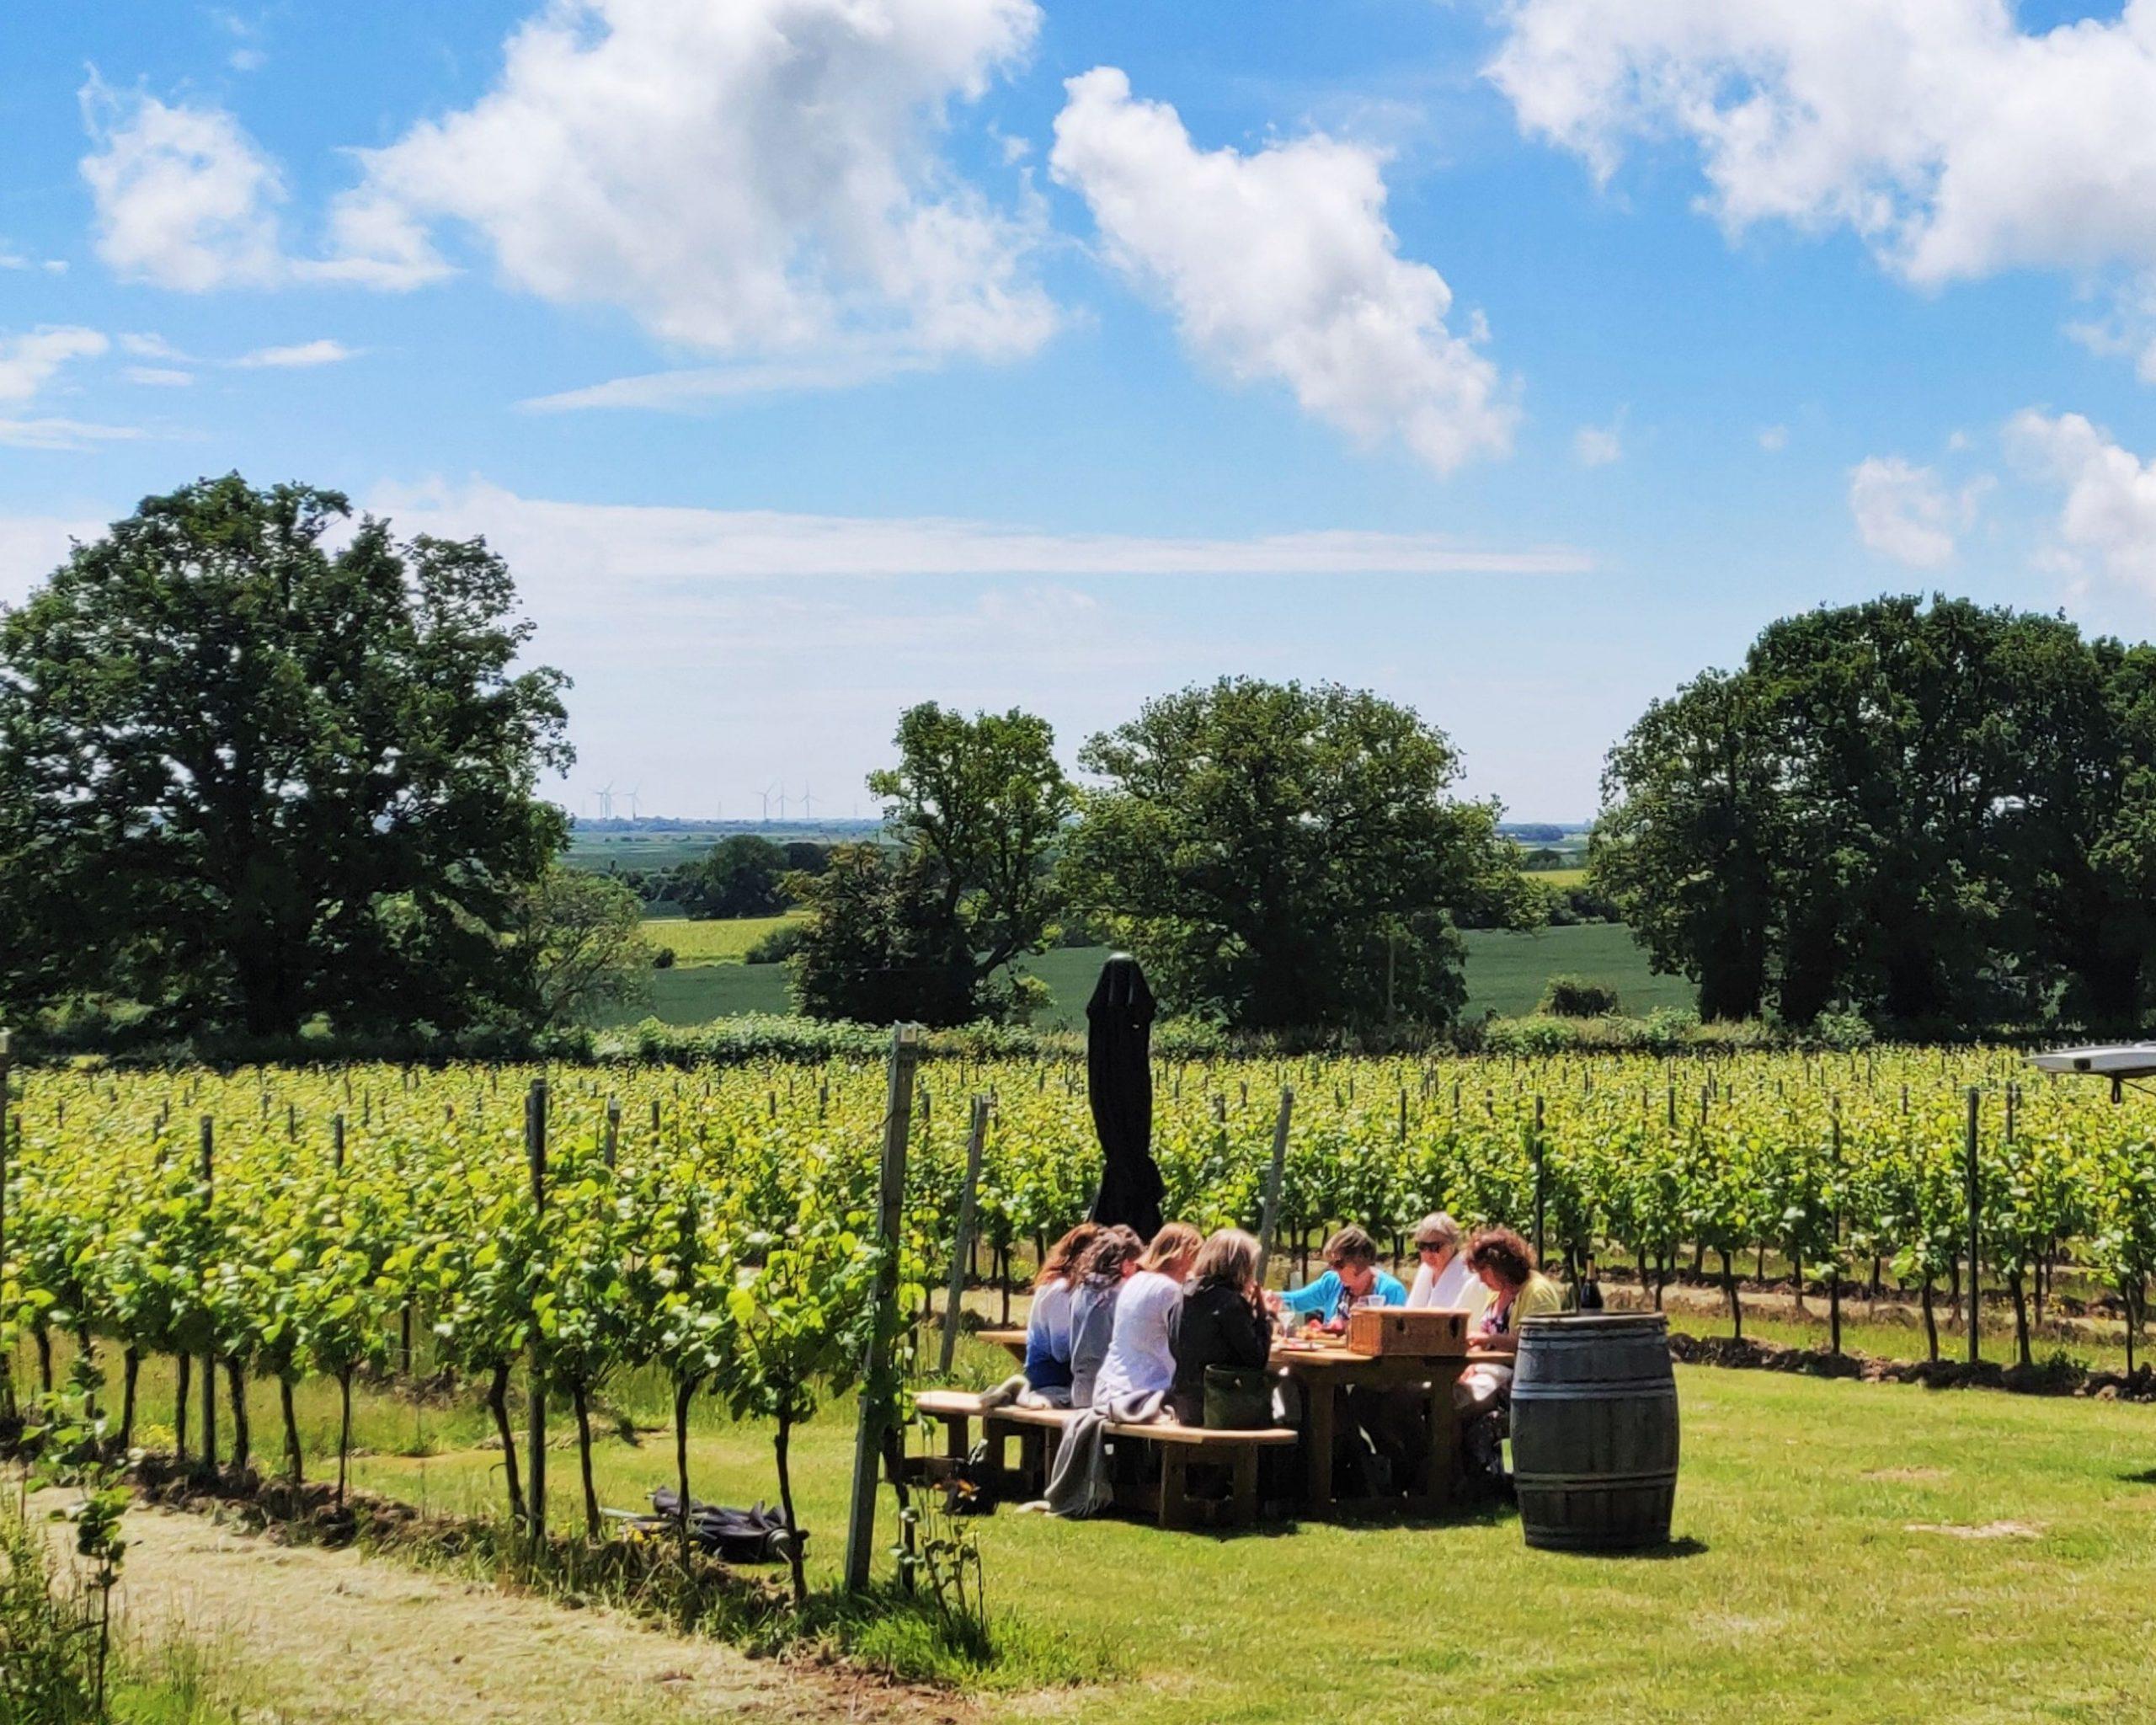 Lunch in a vineyard